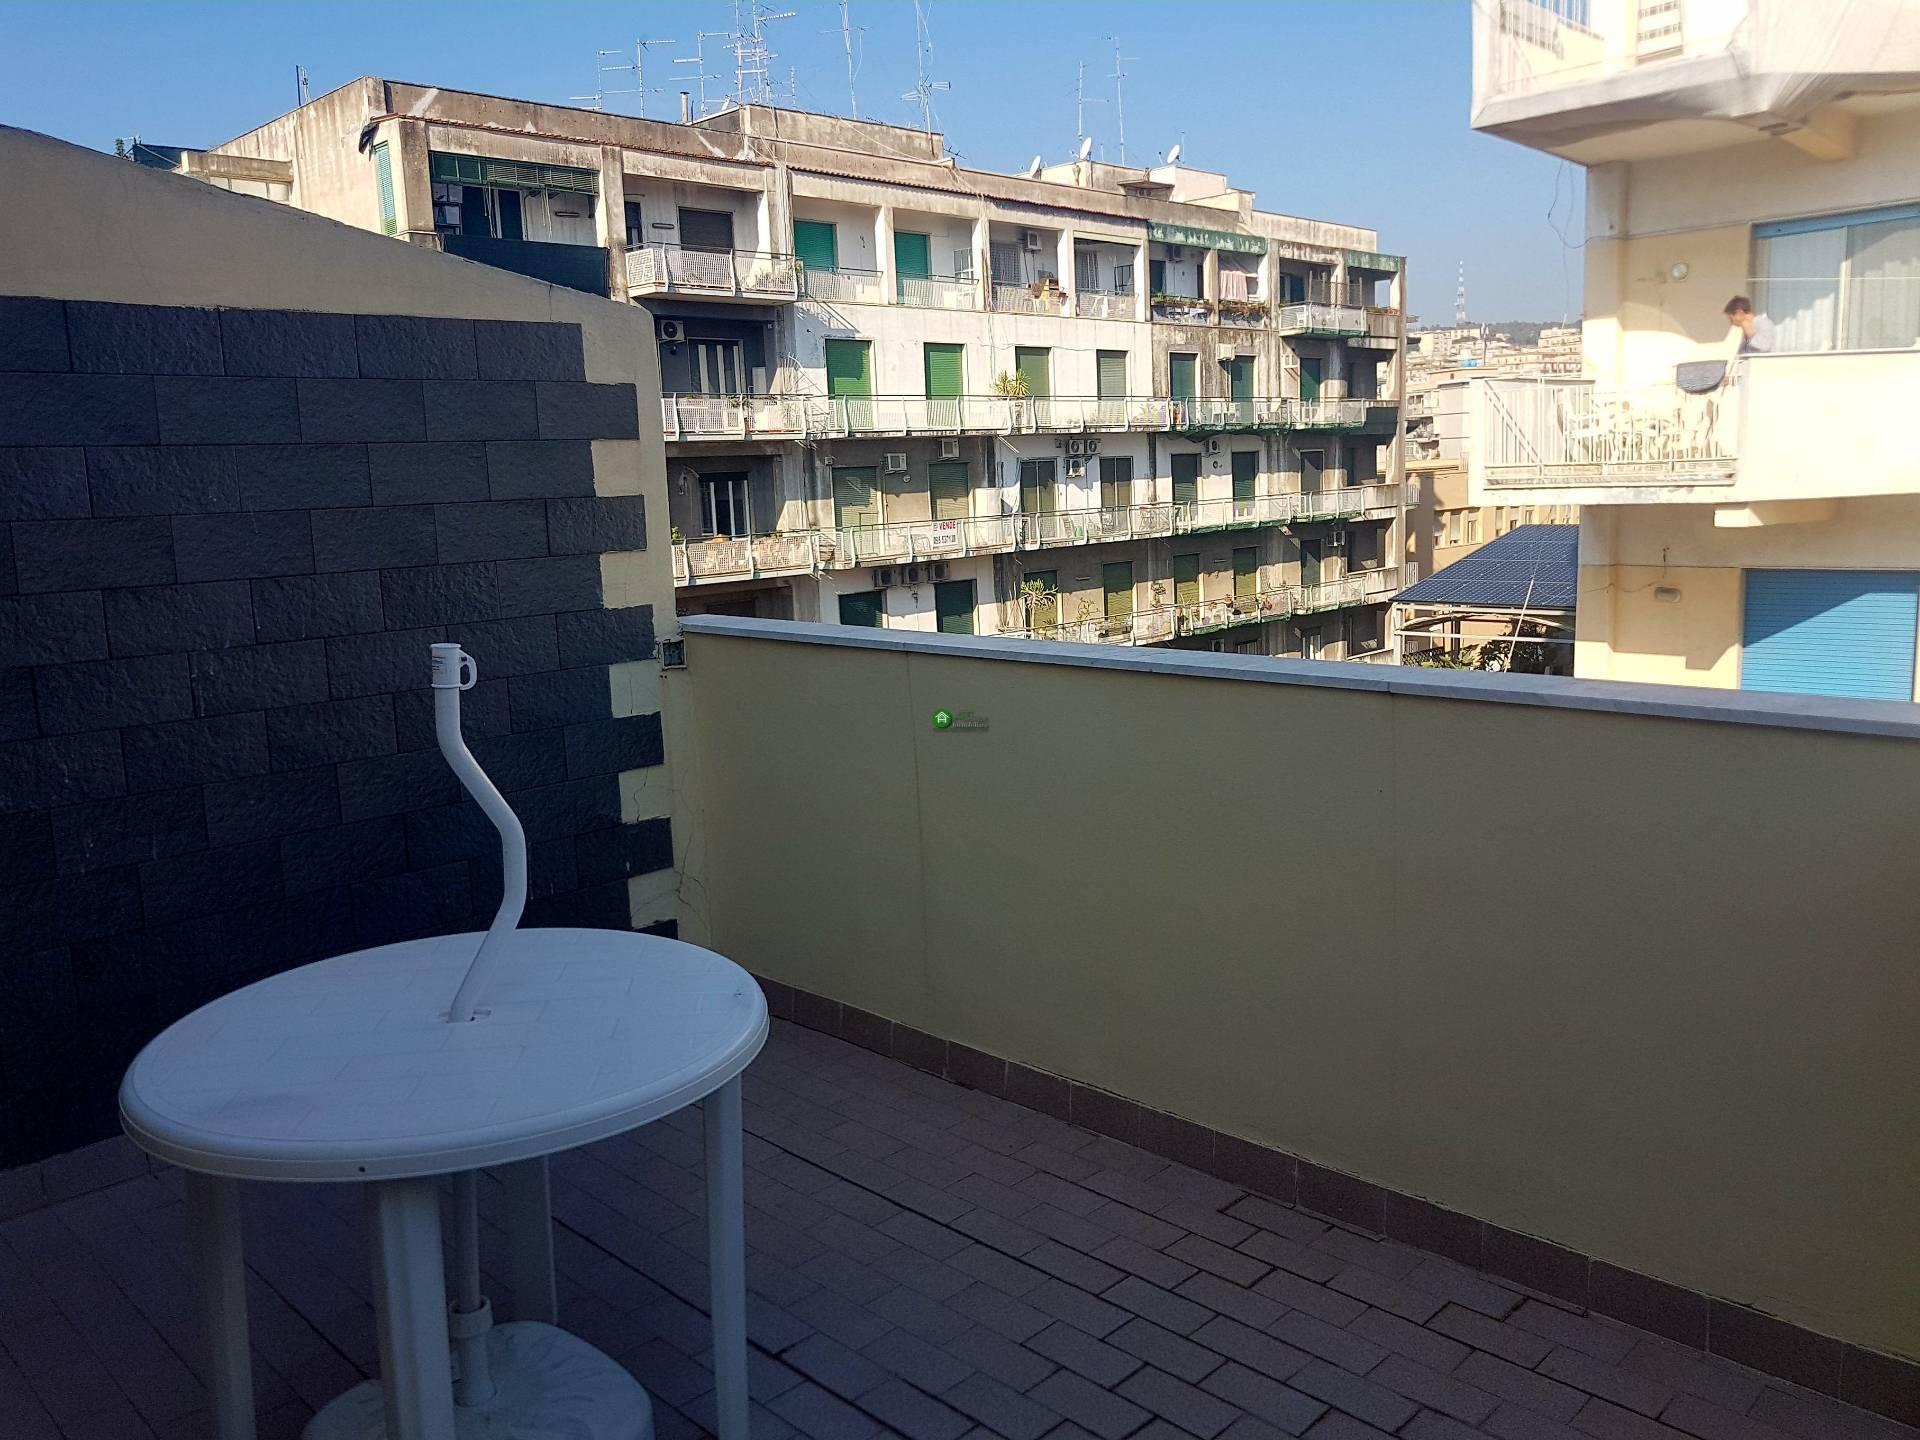 catania affitto quart: zona centro studio-catania-centro-sas-di-corallo-gaetana-&-c